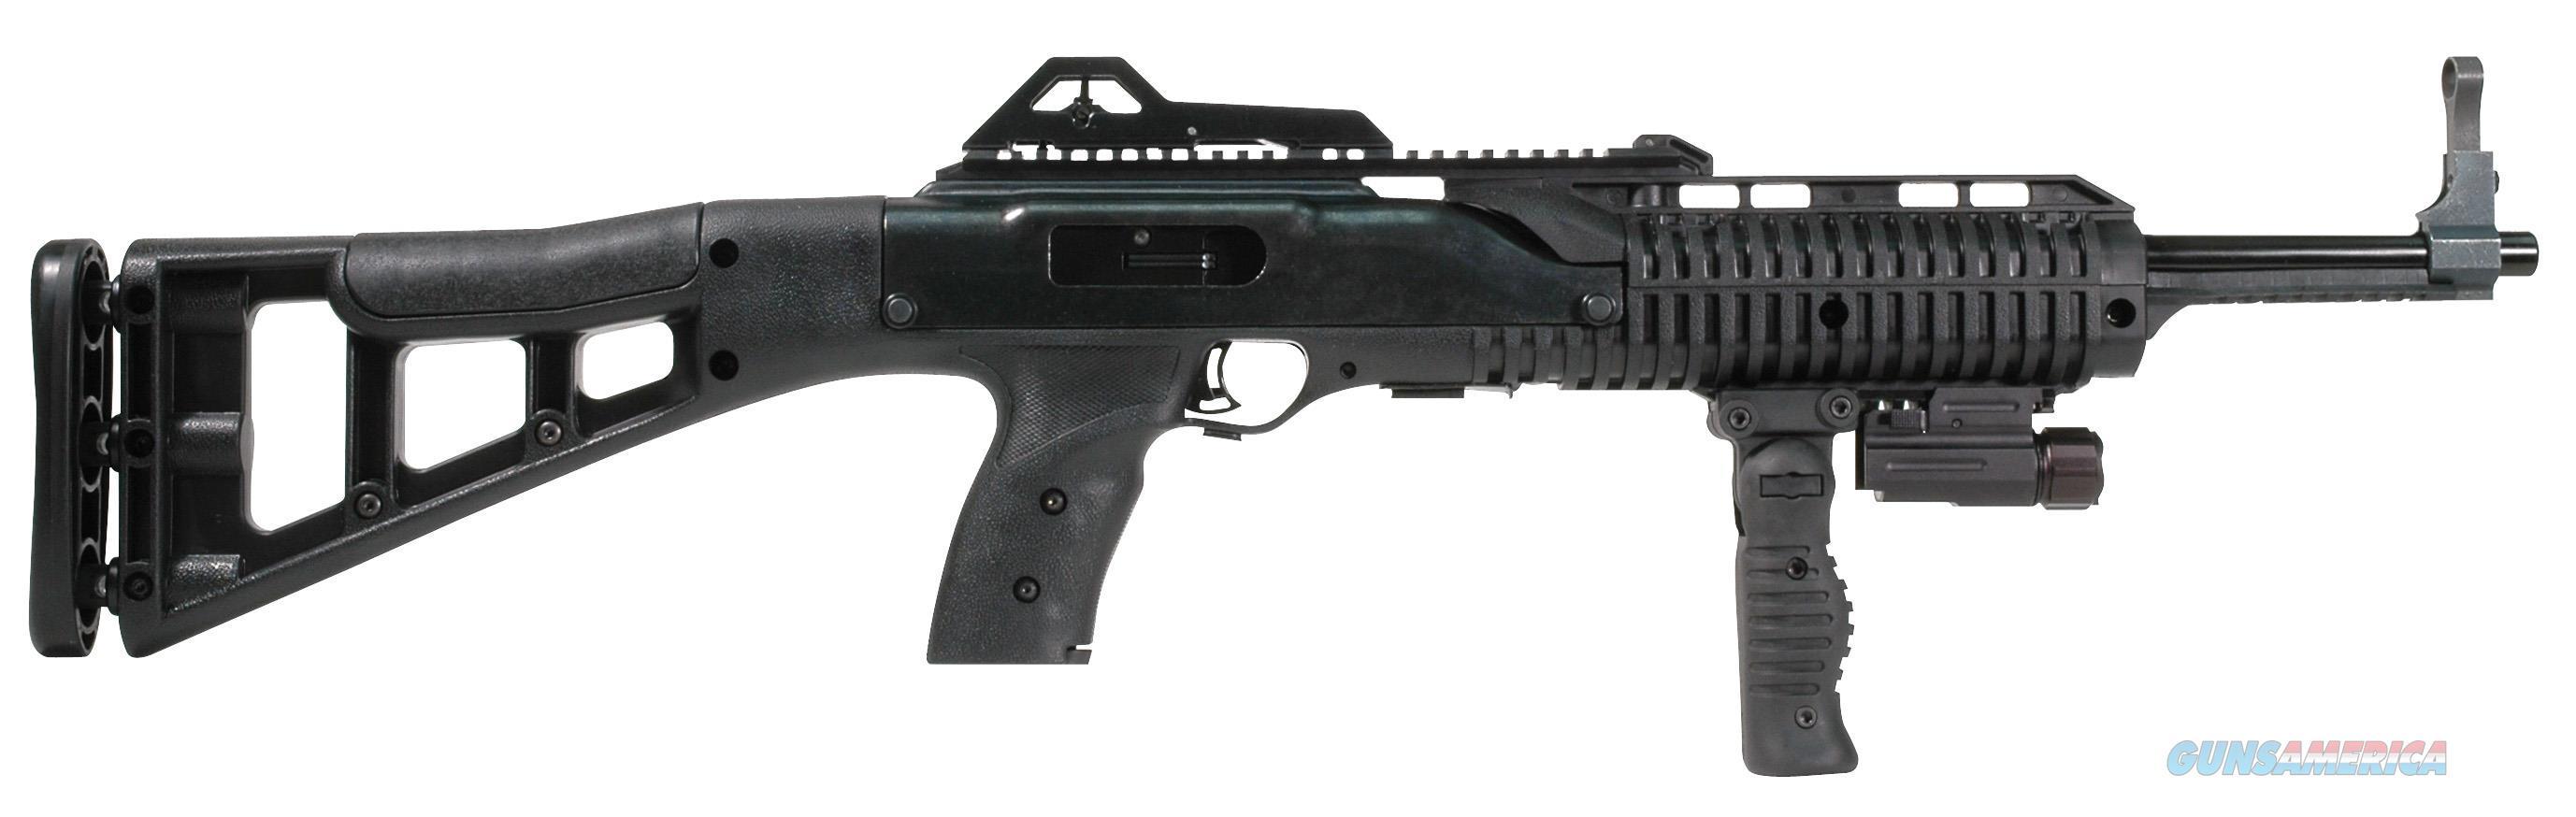 "Hi-Point 995Fgflts 995Ts Carbine Semi-Automatic 9Mm 16.5"" 10+1 With Light Polymer Skeleton Black Stk W/Forward Folding Grip Black 995TS FG FL  Guns > Rifles > H Misc Rifles"